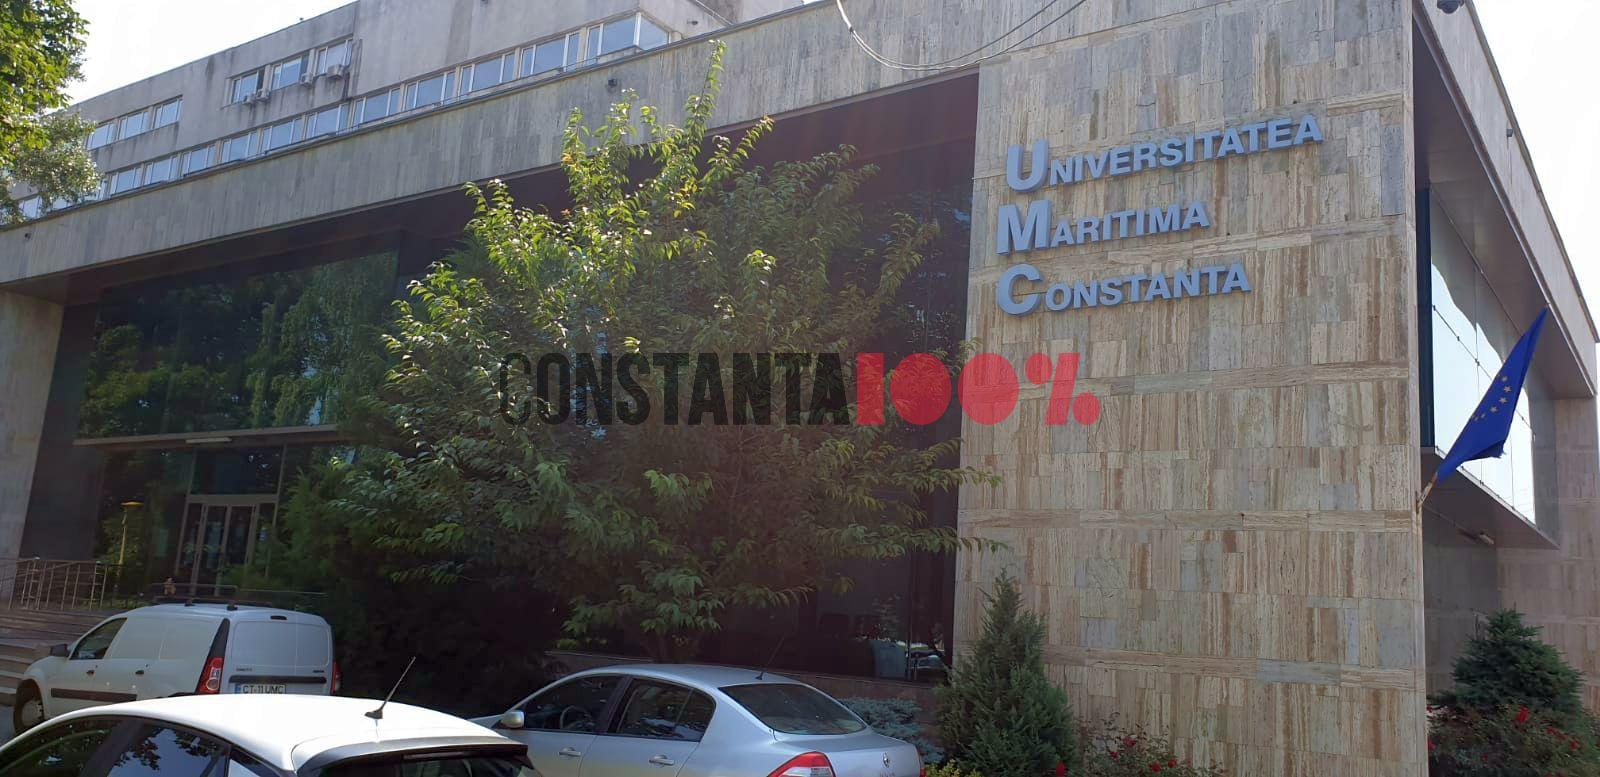 Universitatea Maritima din Constanta